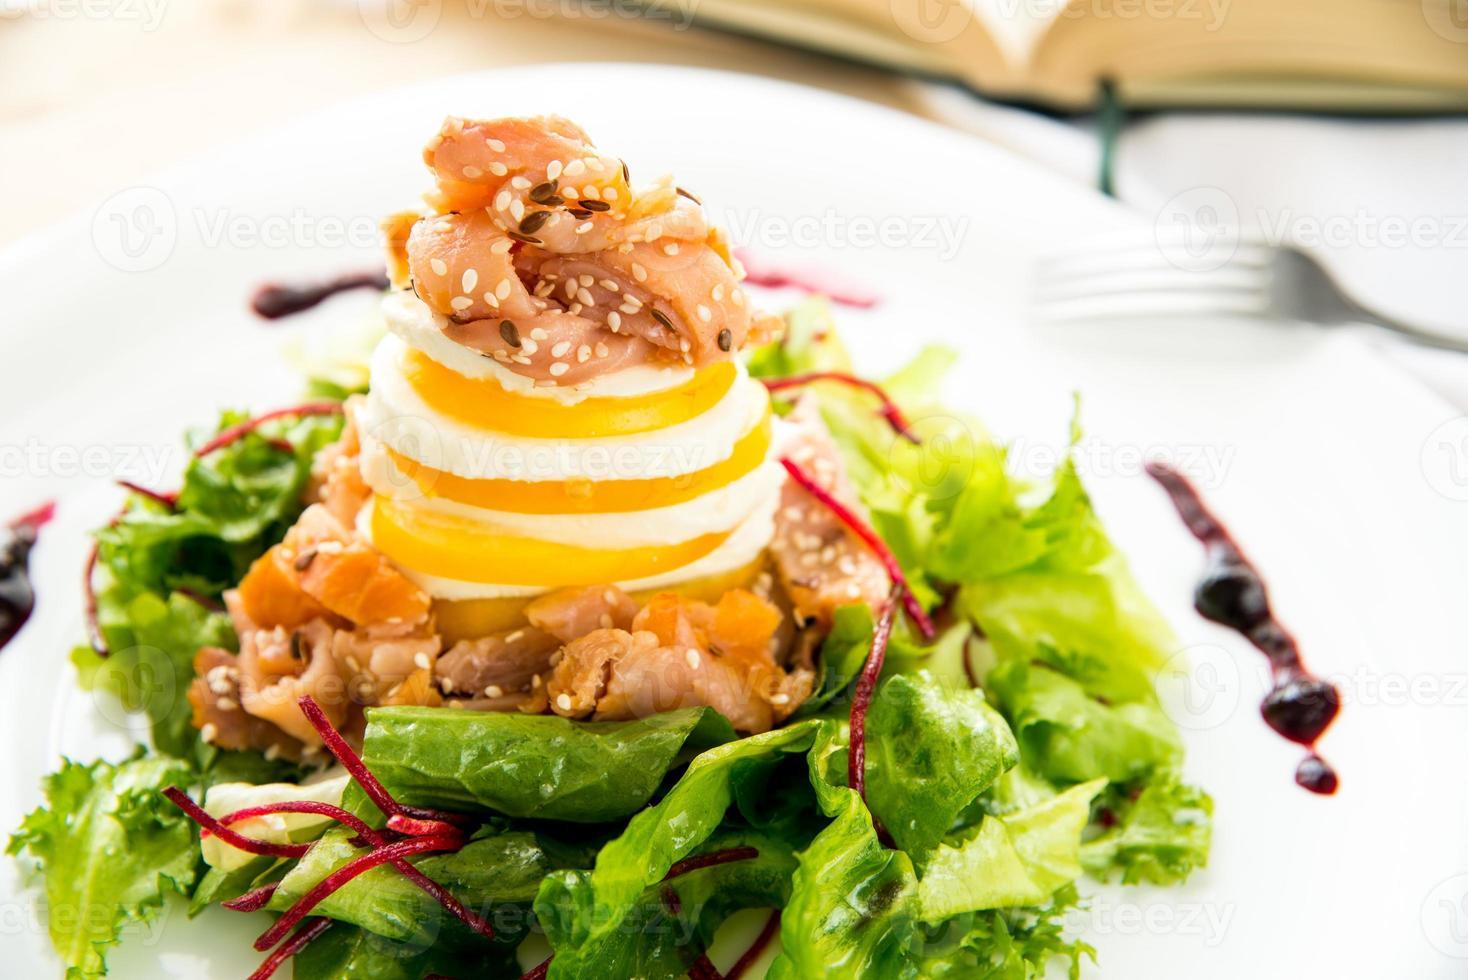 Smoked salmon salad photo